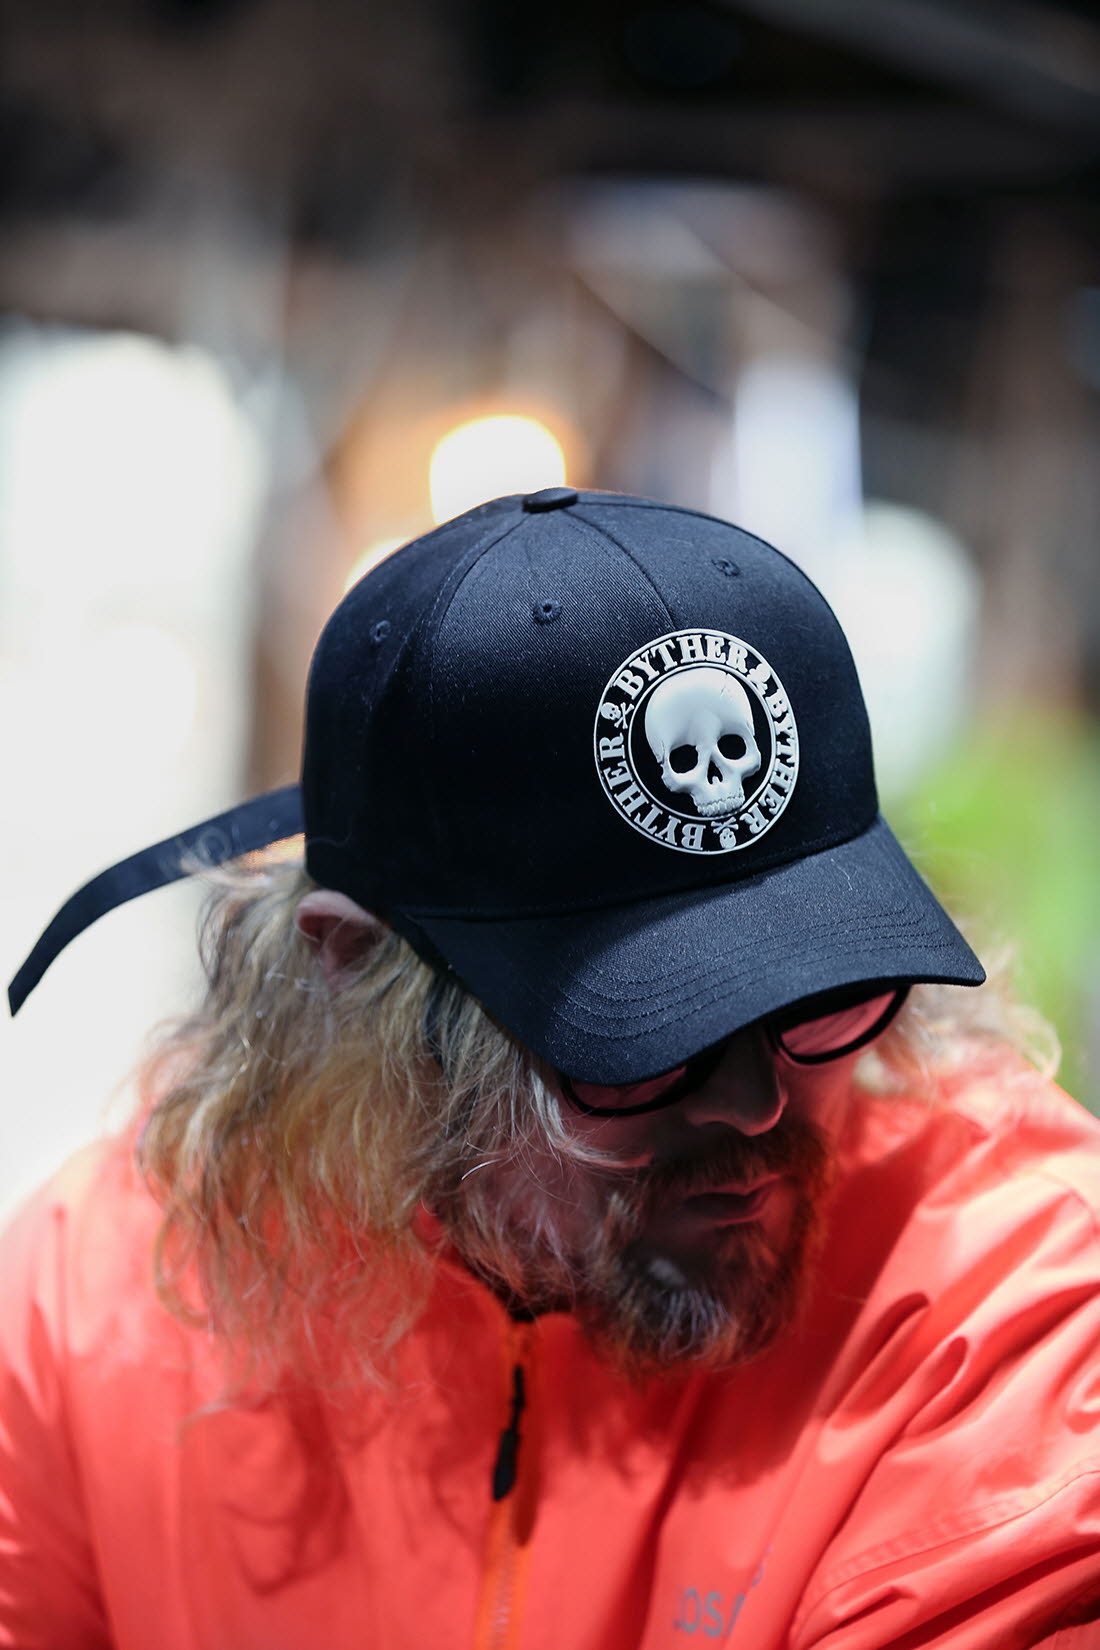 ByTheR Unisex Skull Logo Patch Cotton Ball Cap Black Gym HomeTraining Workout